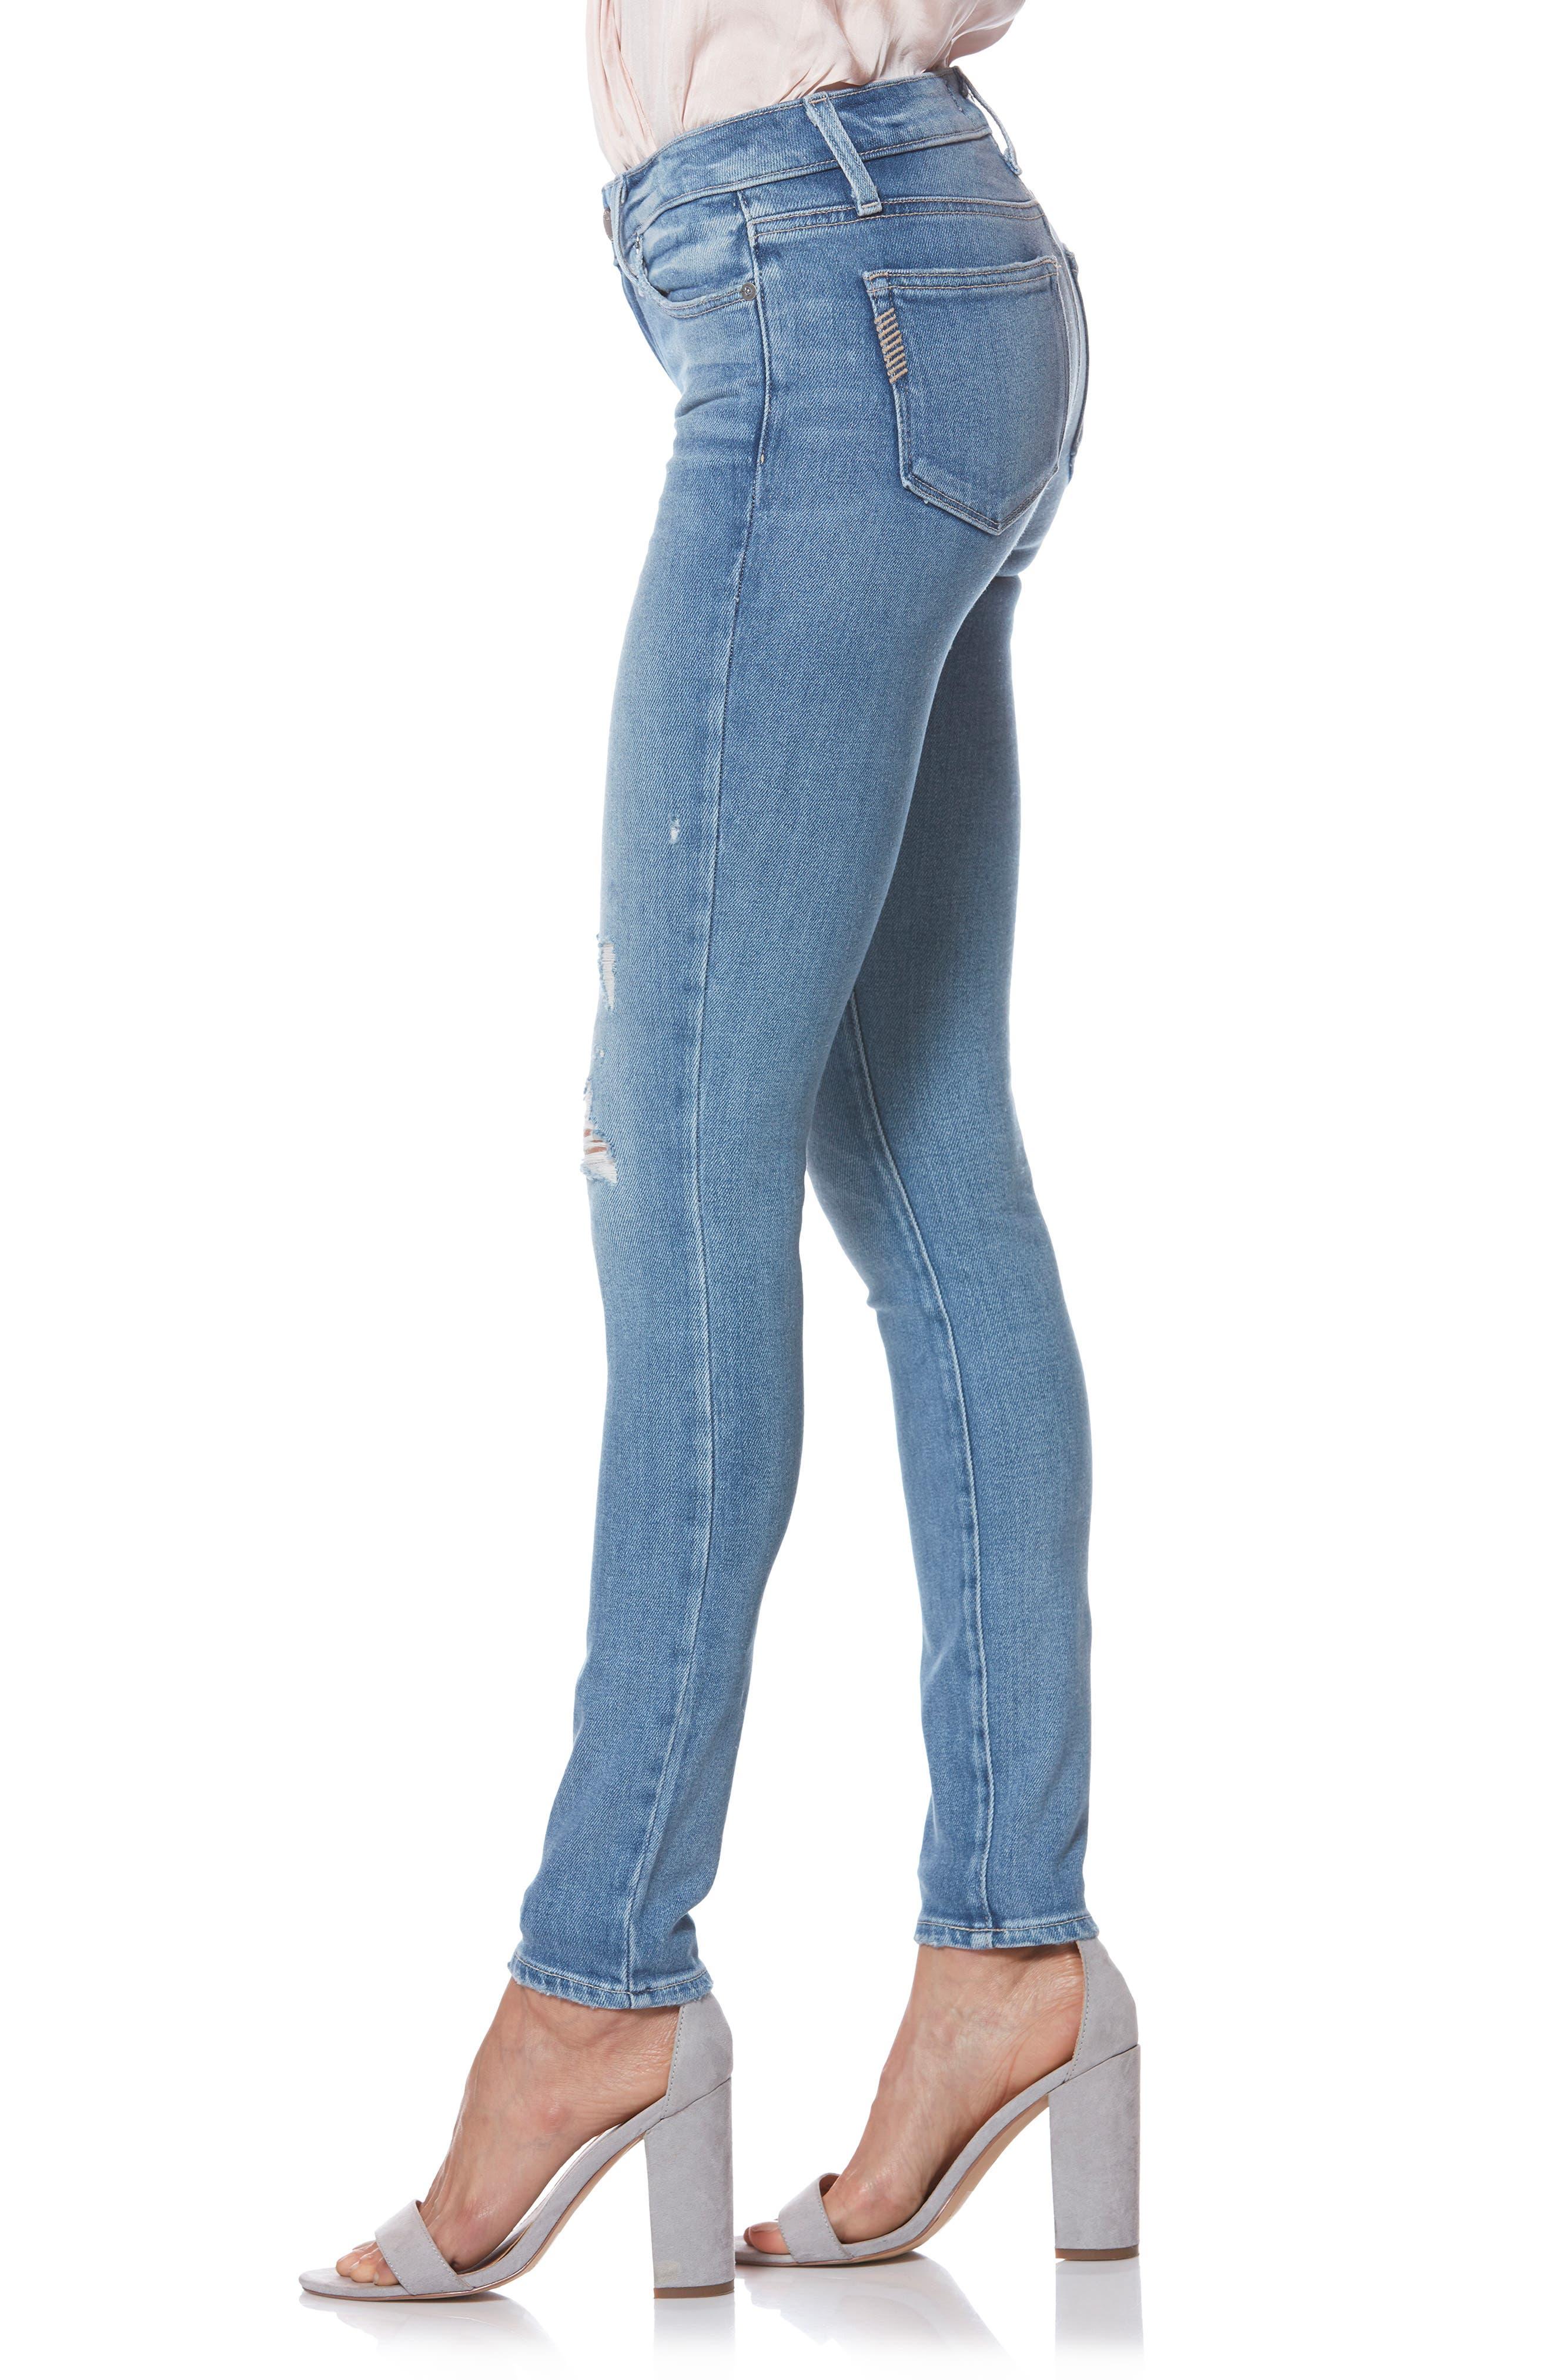 PAIGE,                             Verdugo Ultra Skinny Jeans,                             Alternate thumbnail 4, color,                             KAYSON DISTRESSED